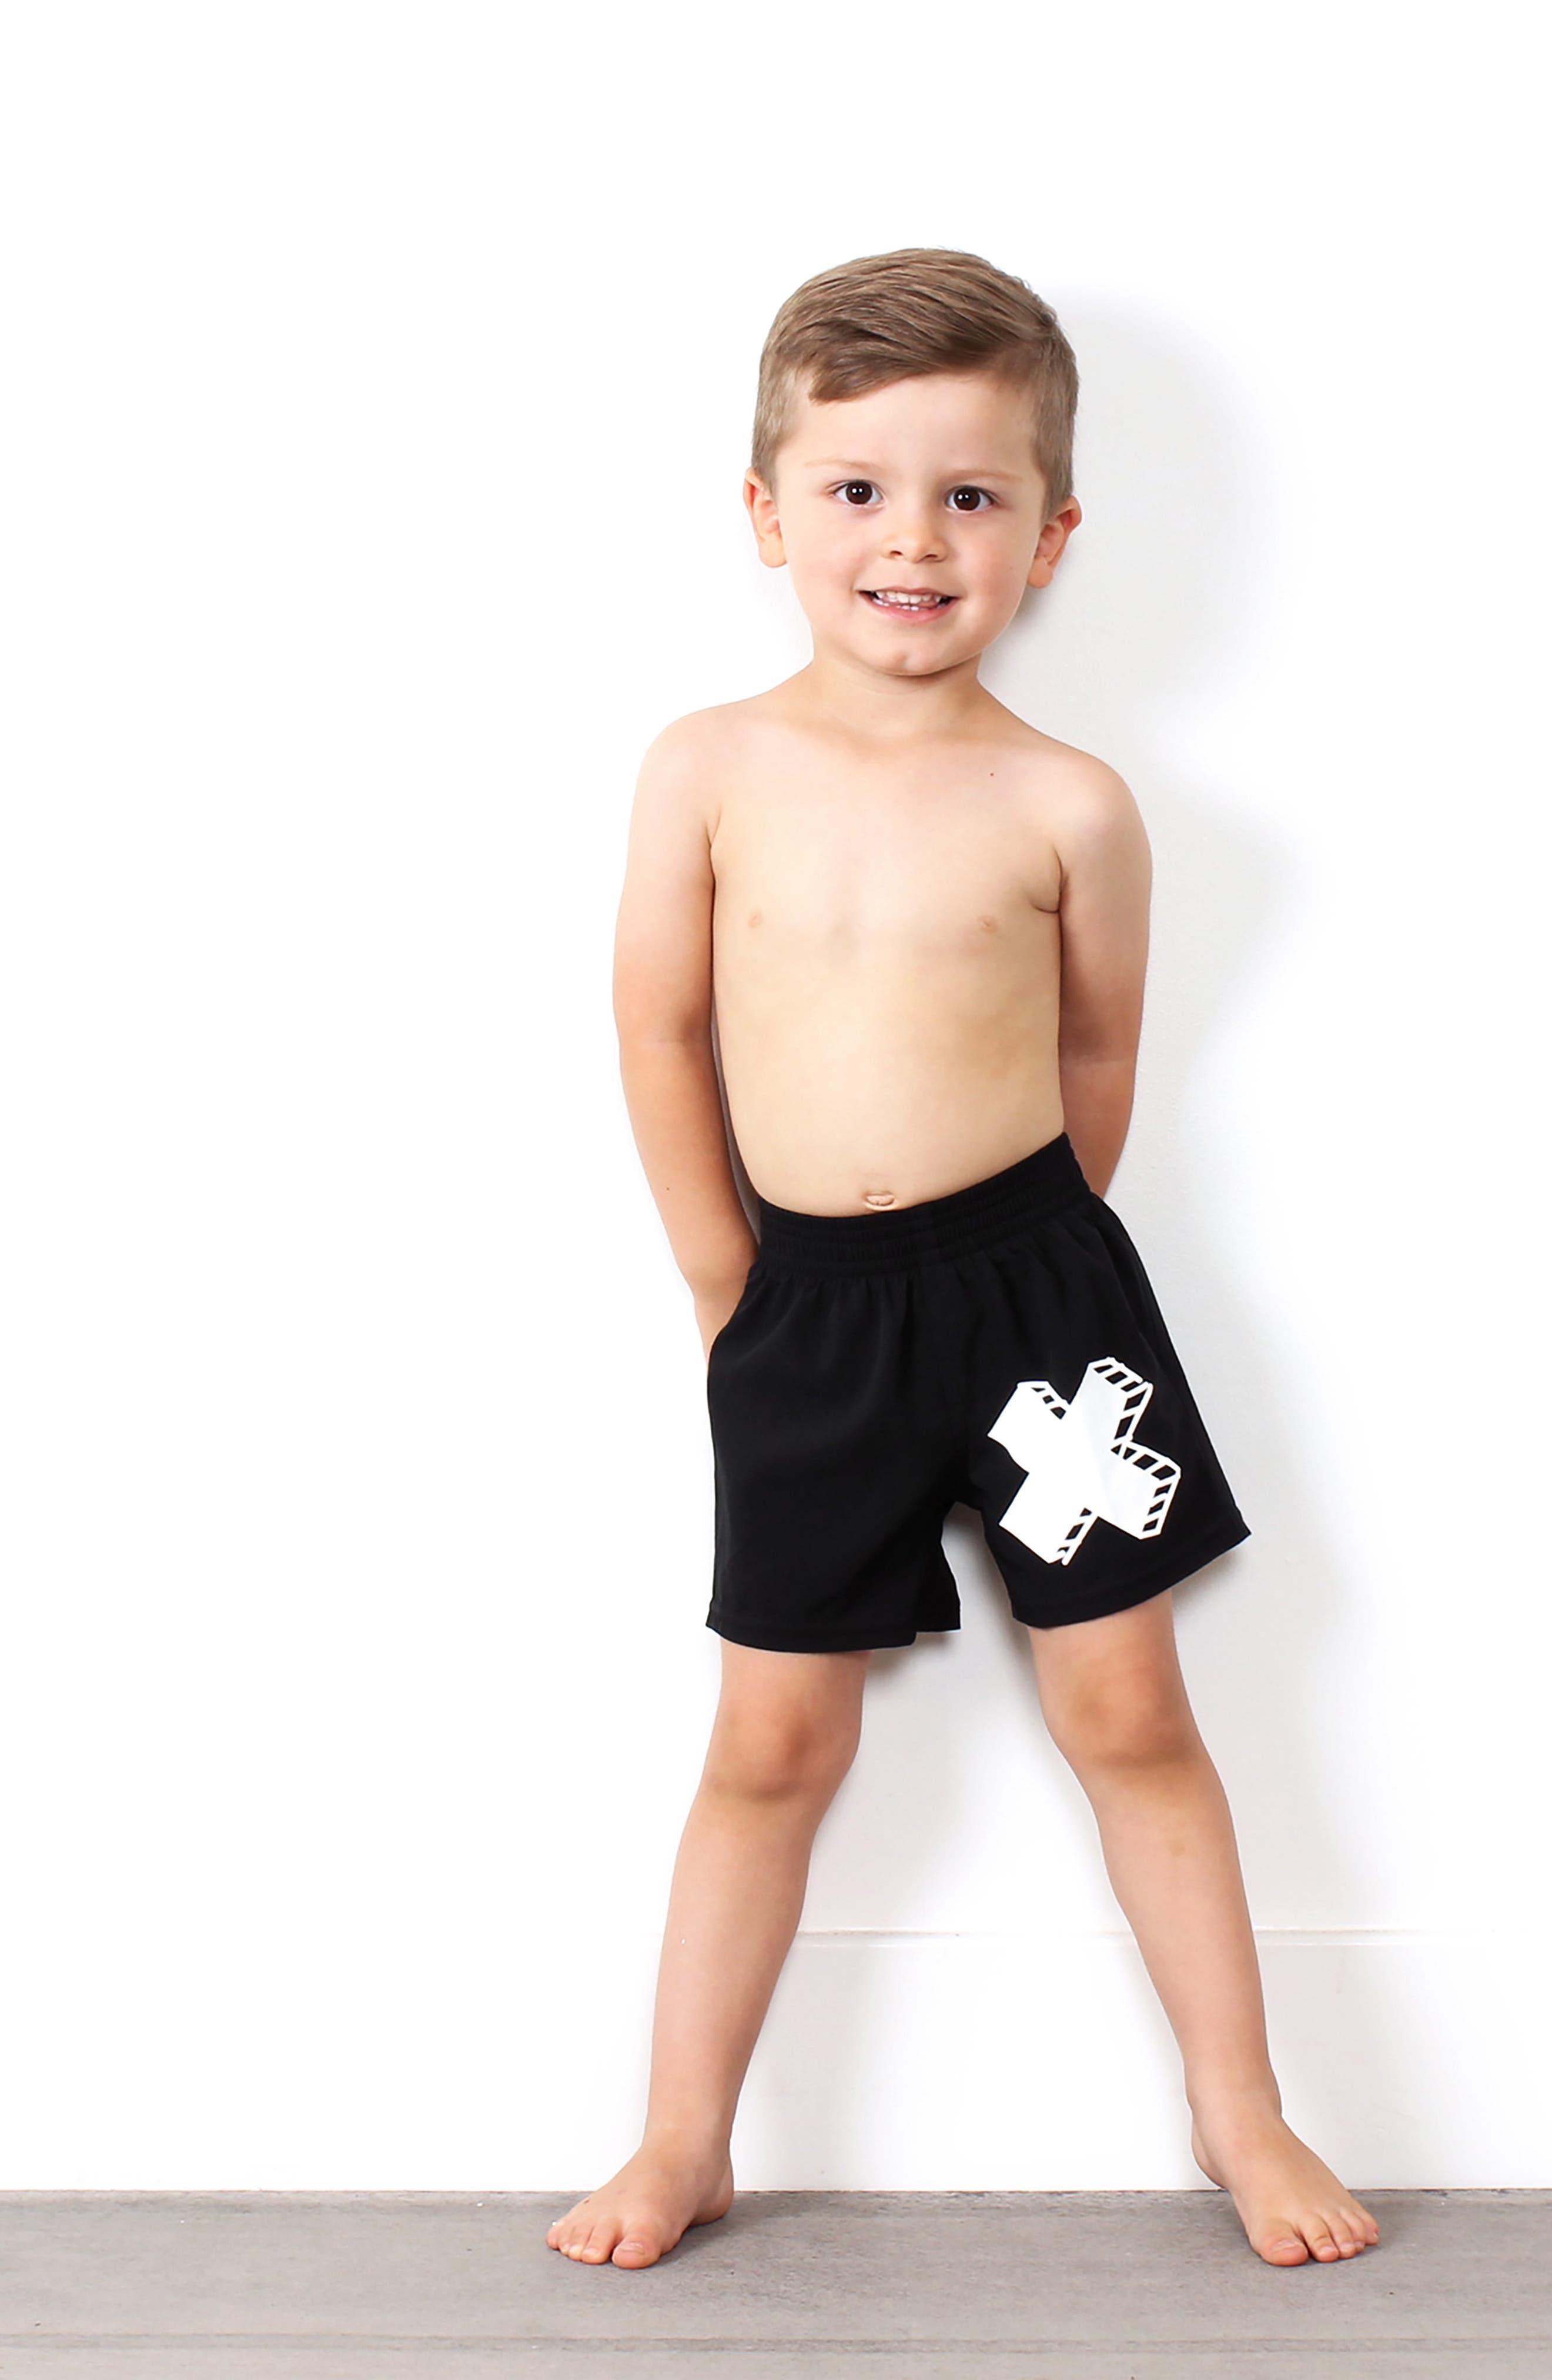 caf036c88c6a Swimwear for Baby   Kids – Swimsuits   Swim Trunks